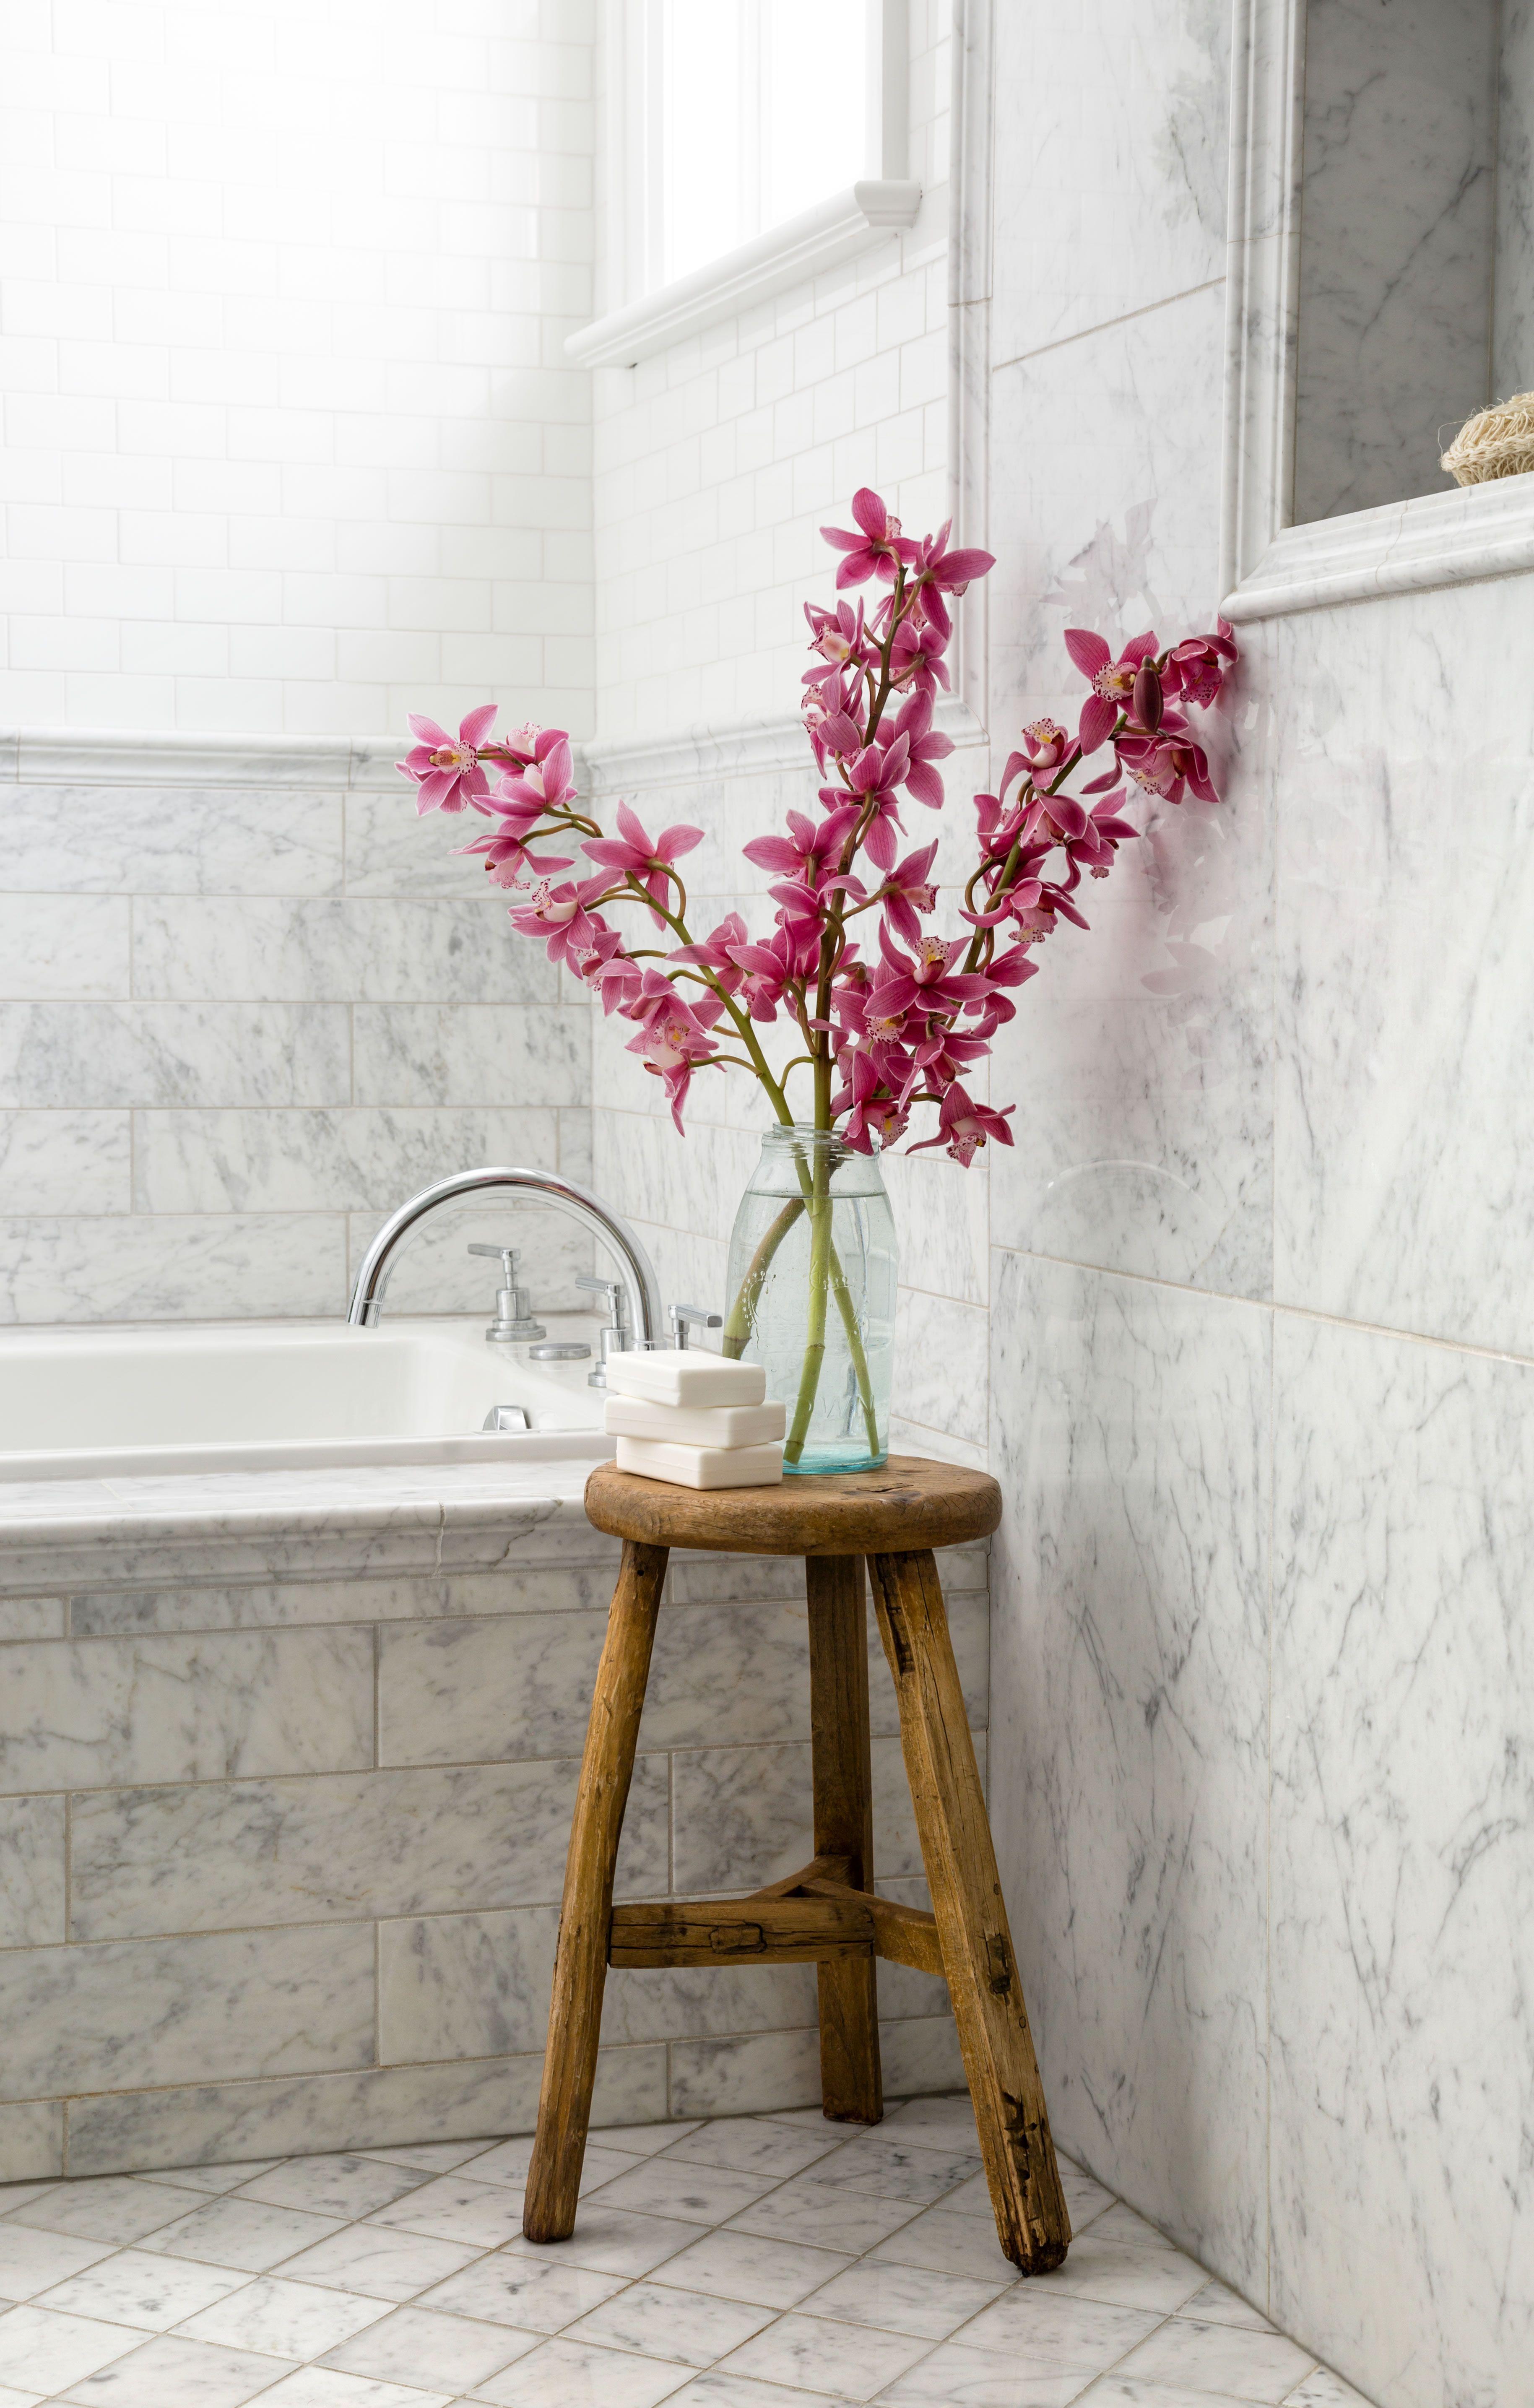 Wooden Stool Gallerie B Adding Colour To A Bathroom Beautiful Bathrooms Decor Bathroom Decor Caprieze fresso bathroom design